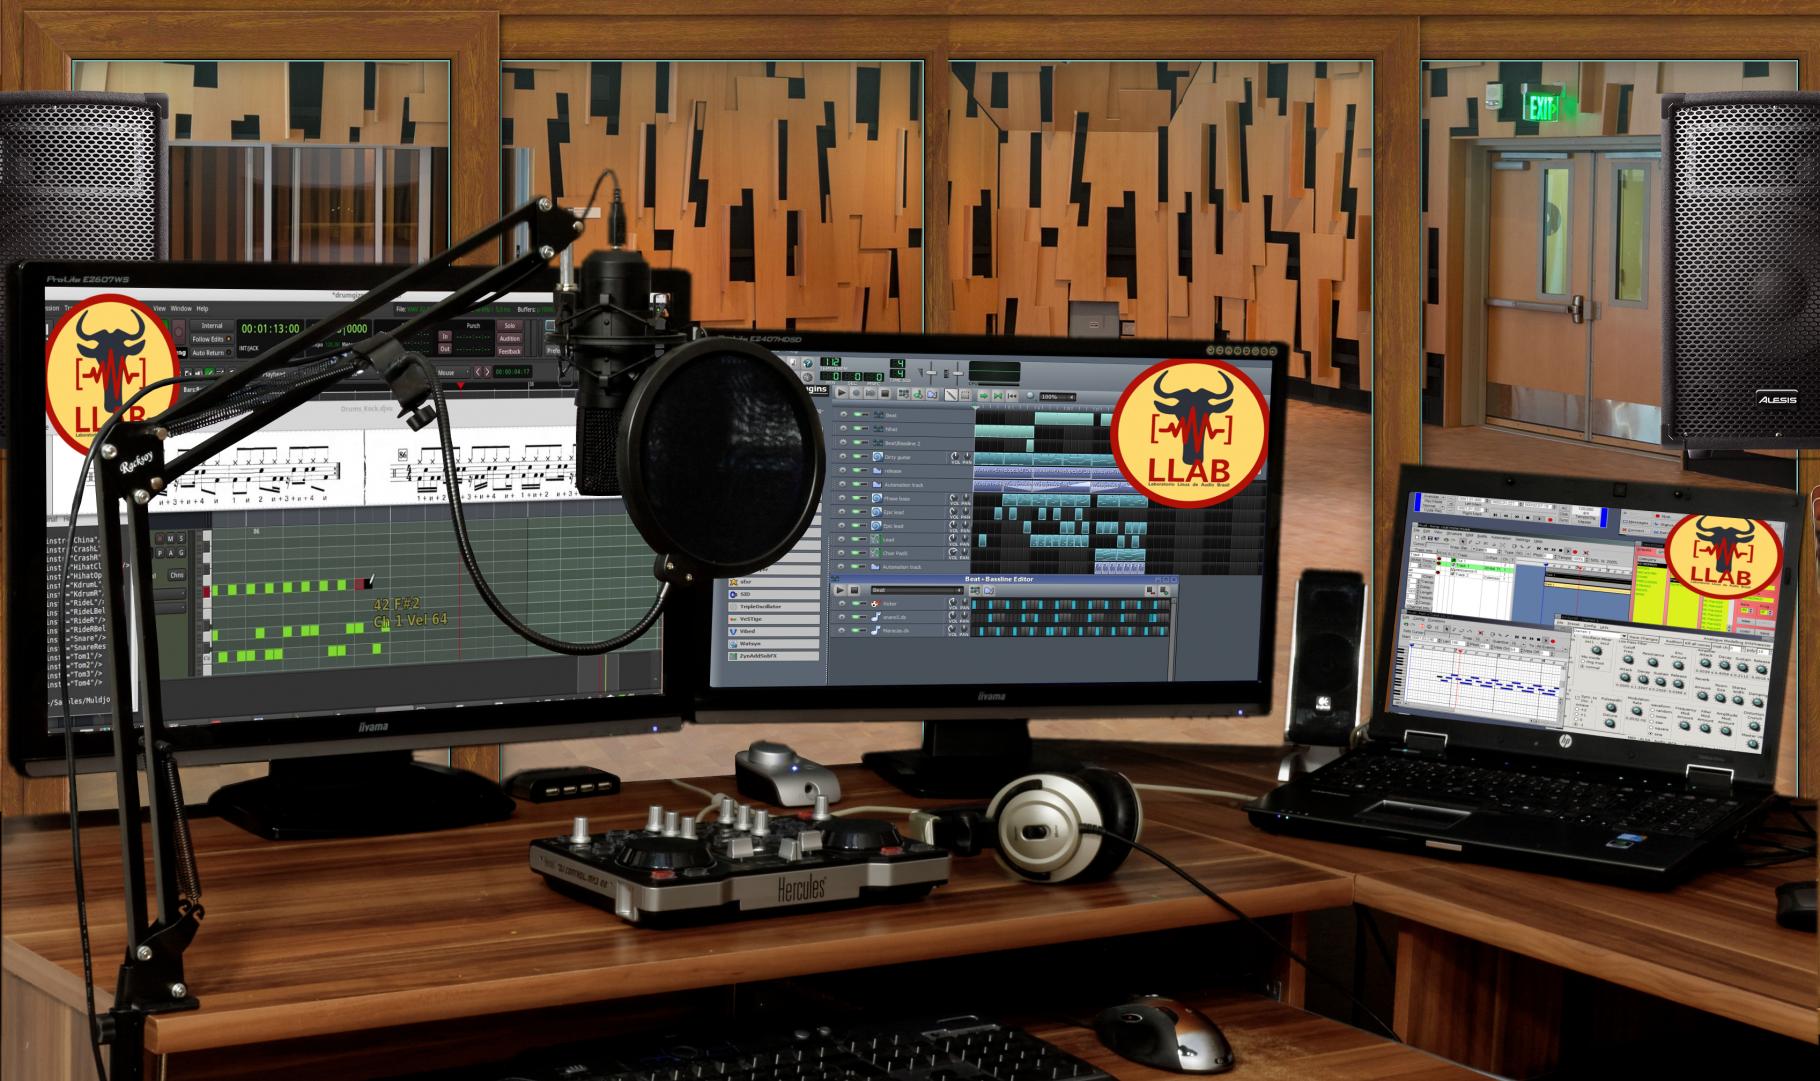 LLAB - Laboratório Linux de Áudio Brasil